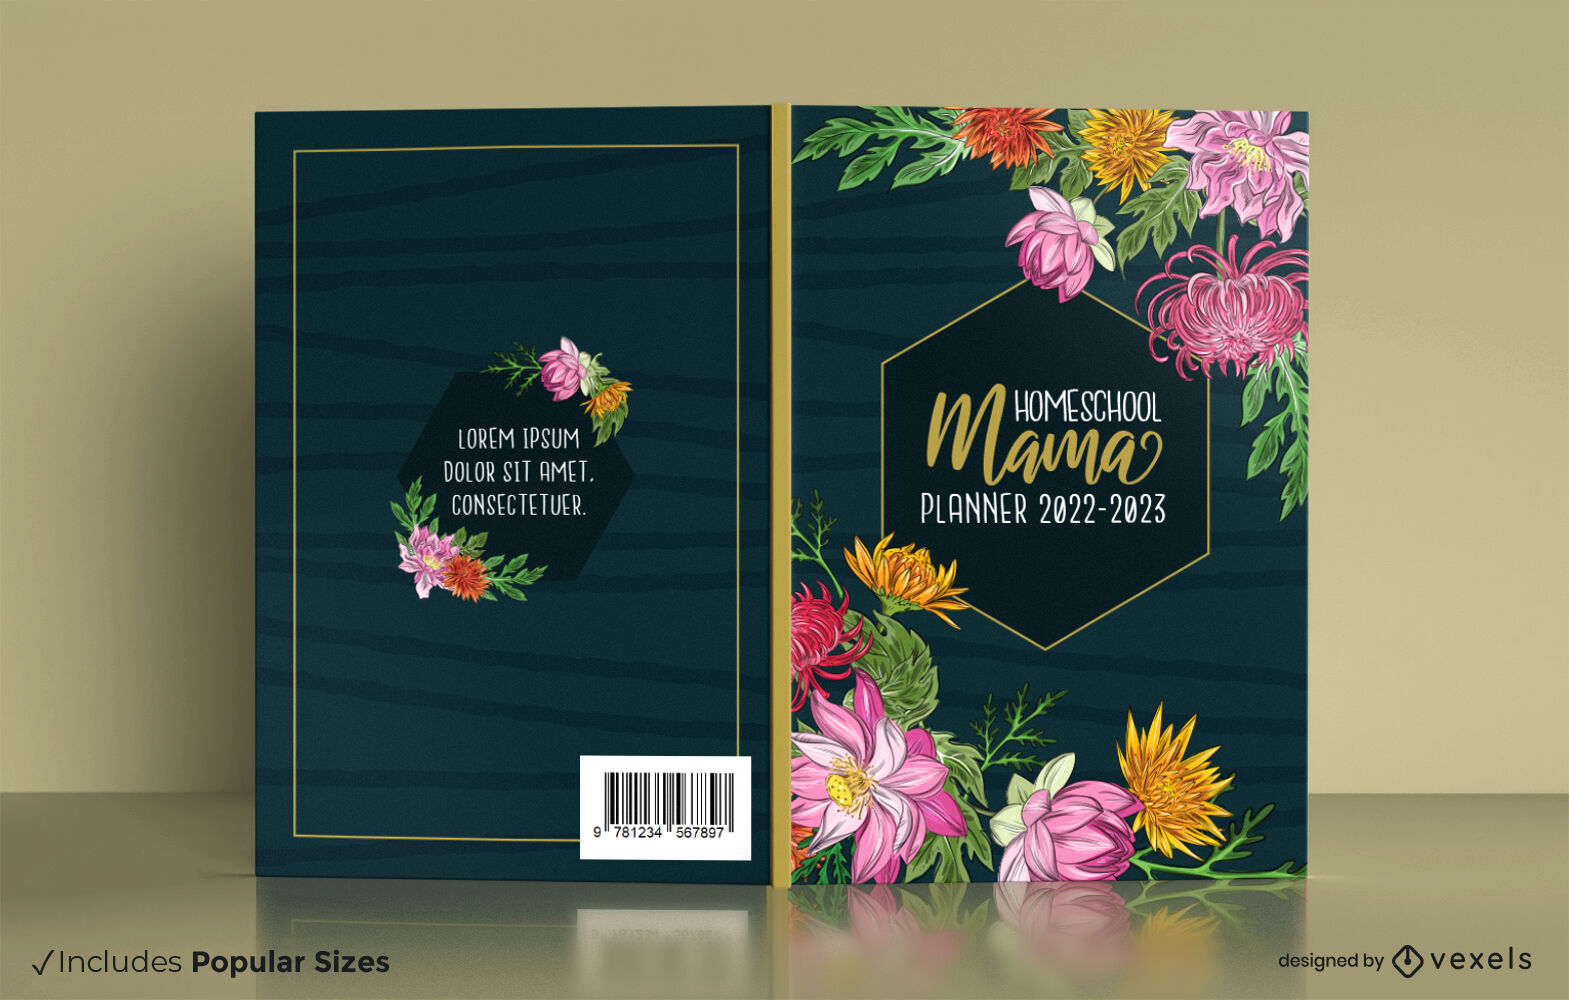 Floral homeschool planner cover design